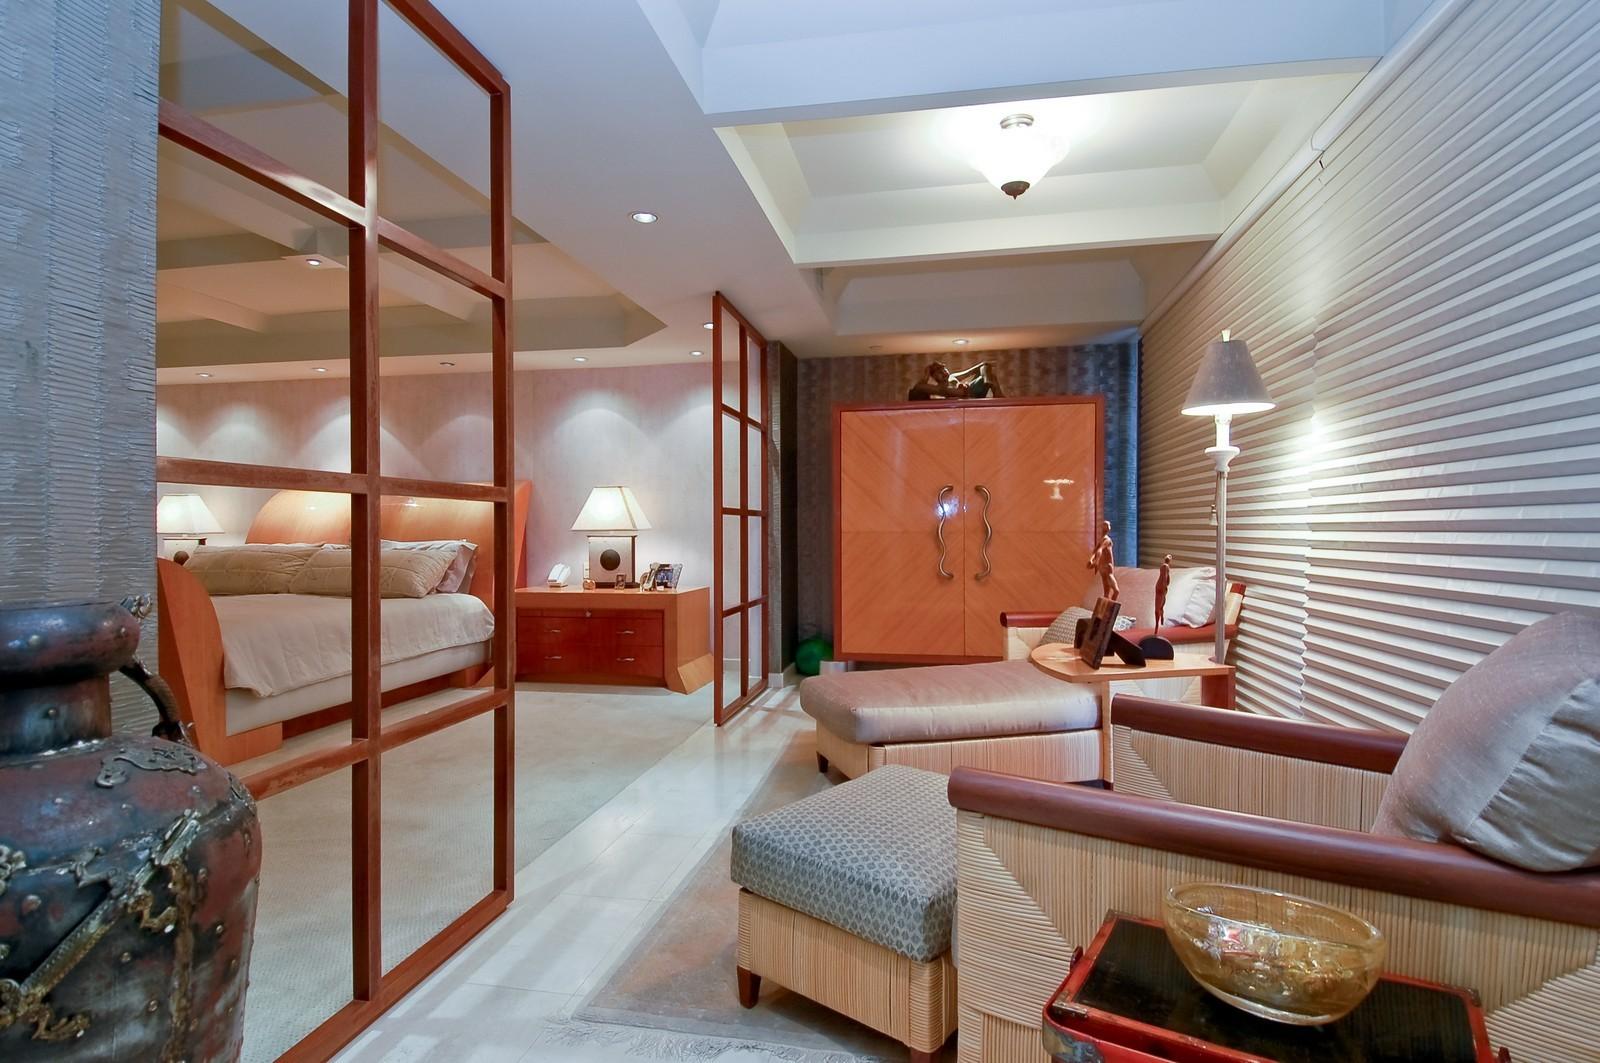 Real Estate Photography - 1500 S Ocean Blvd, Unit S903/4, Boca Raton, FL, 33432 - Master Bedroom